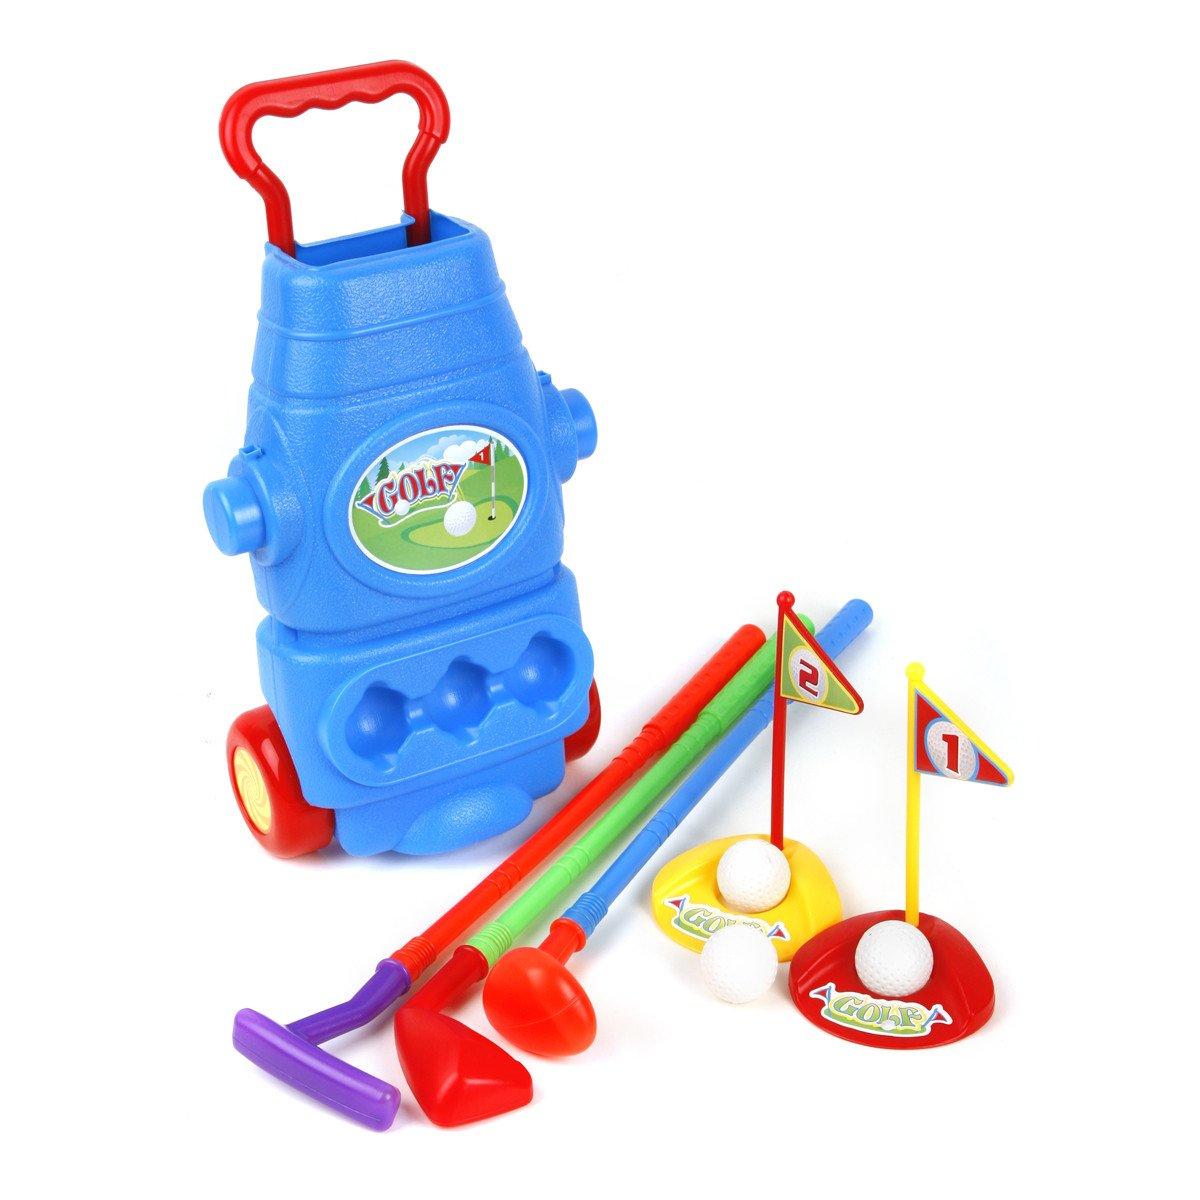 Ojam Swing 'N Play Kids Toy Golf Set (9) (9 Piece)